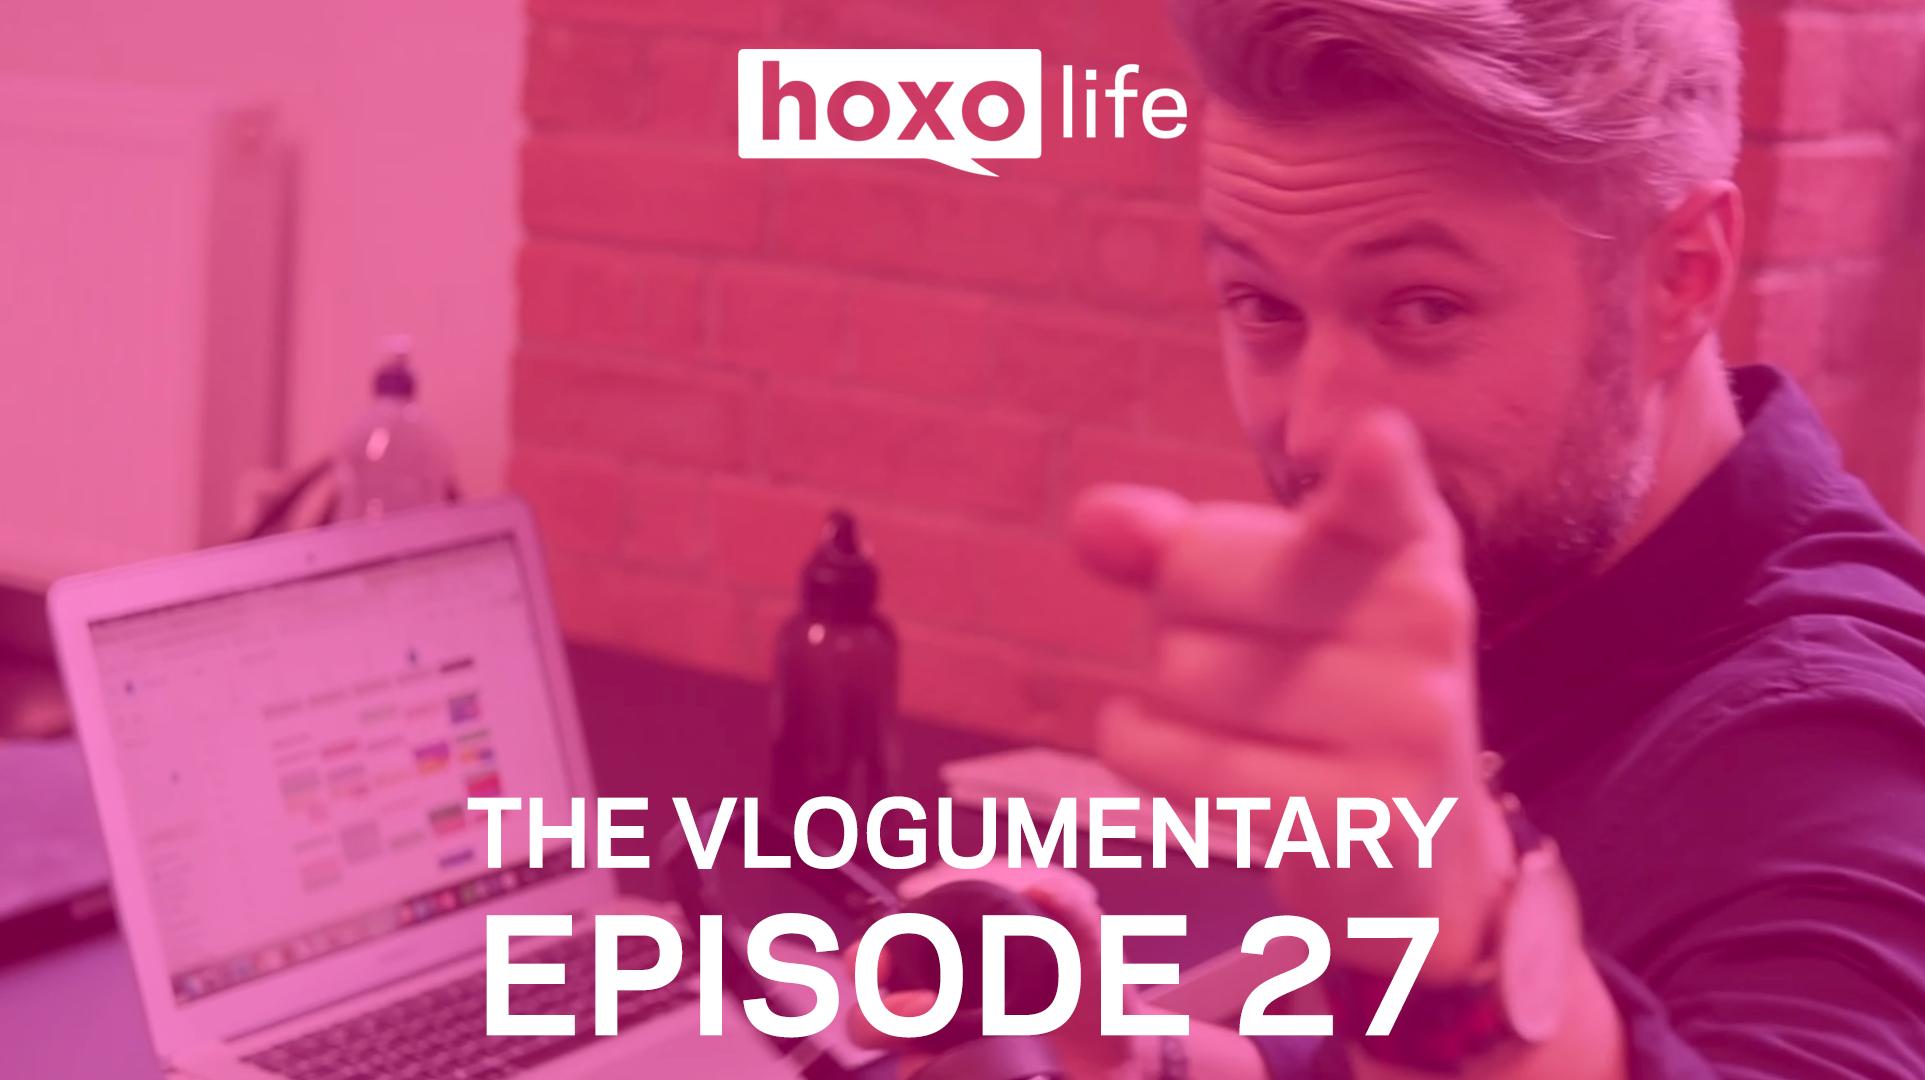 Hoxo Life 27